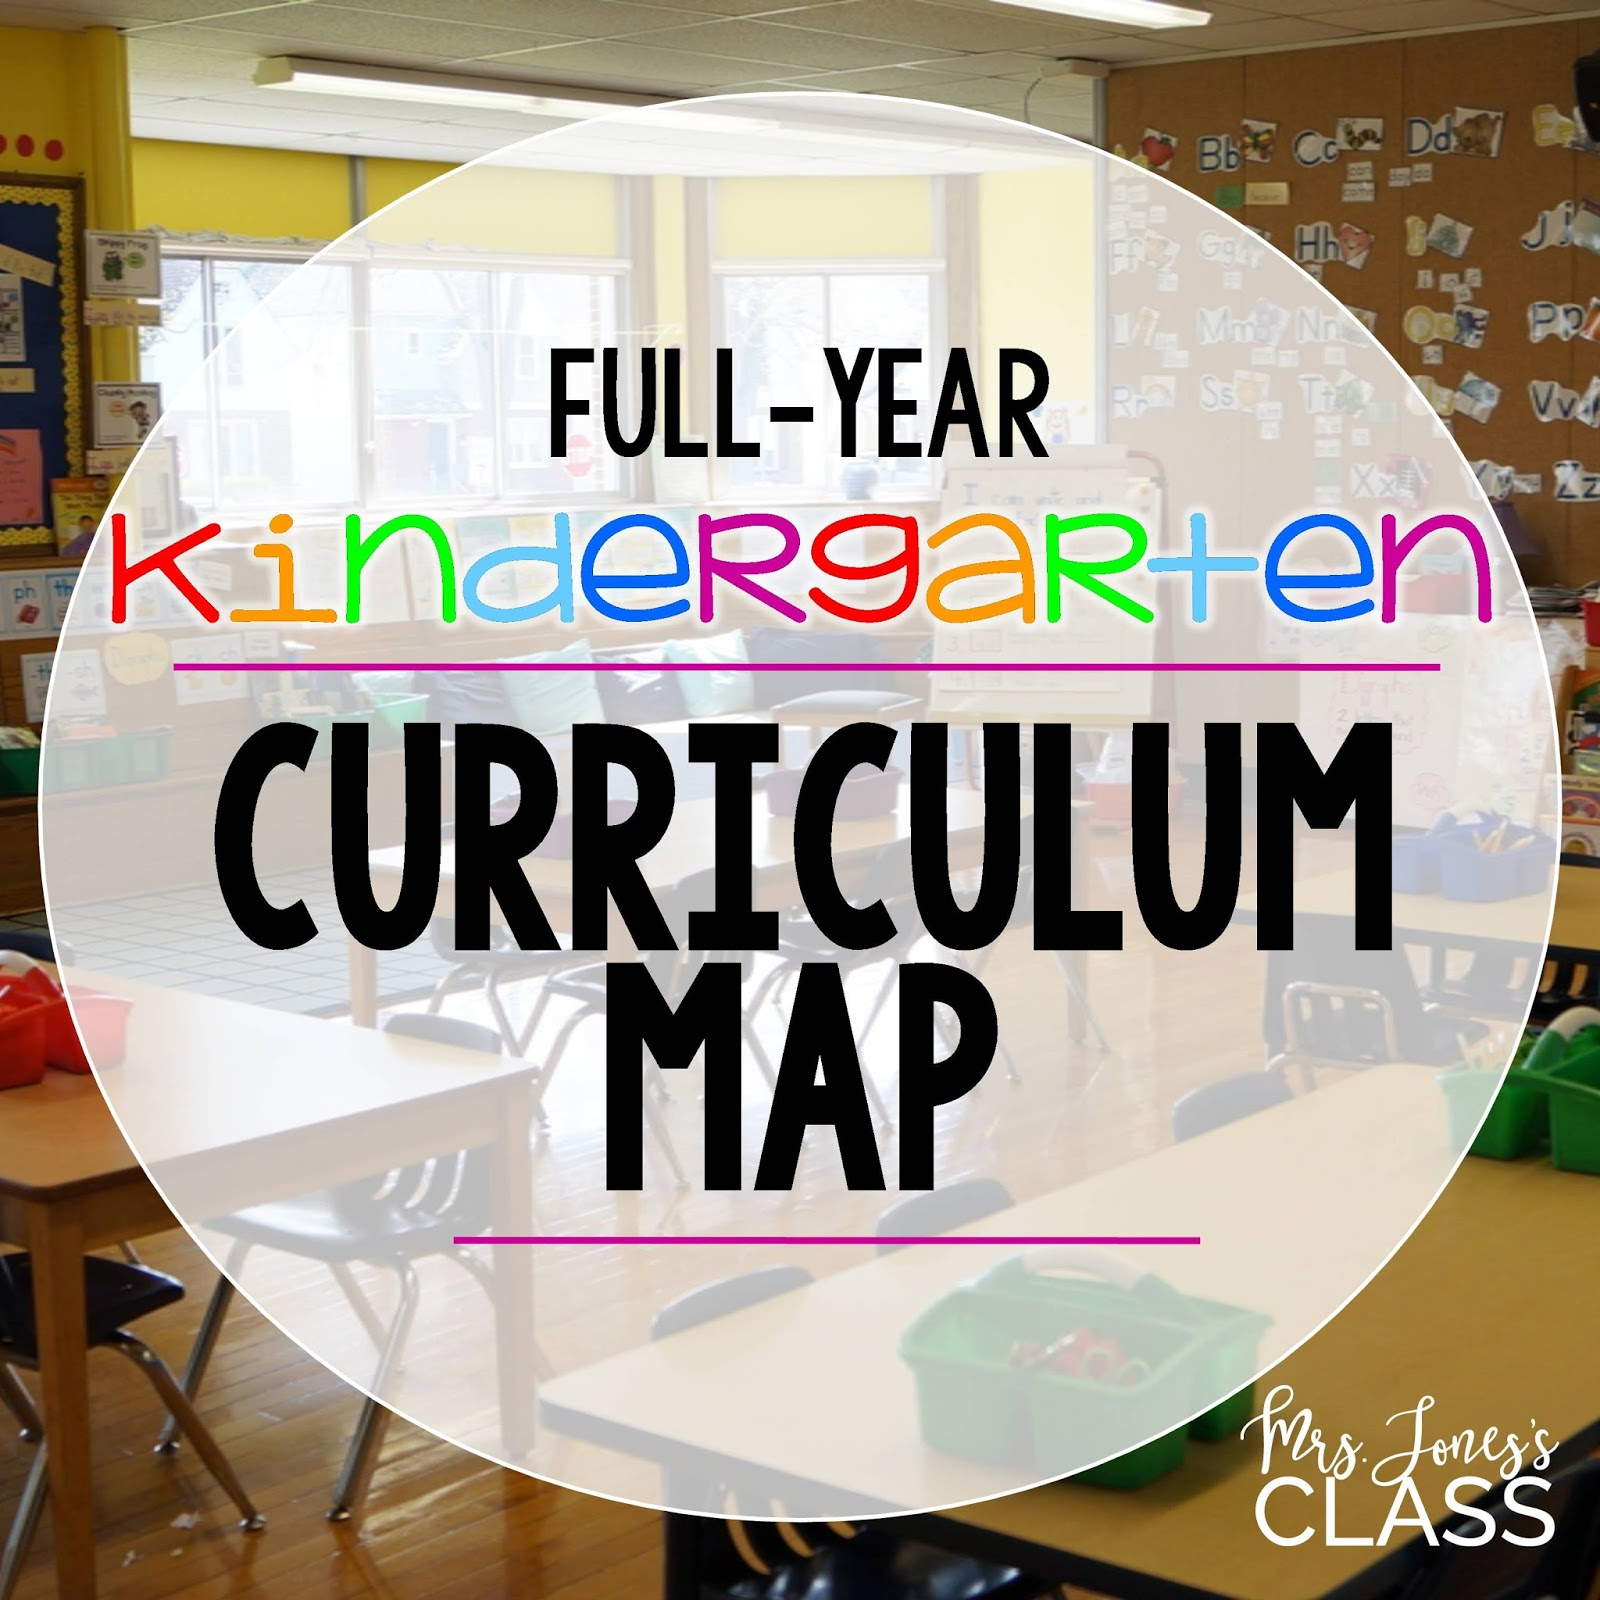 Full Year Kindergarten Curriculum Map